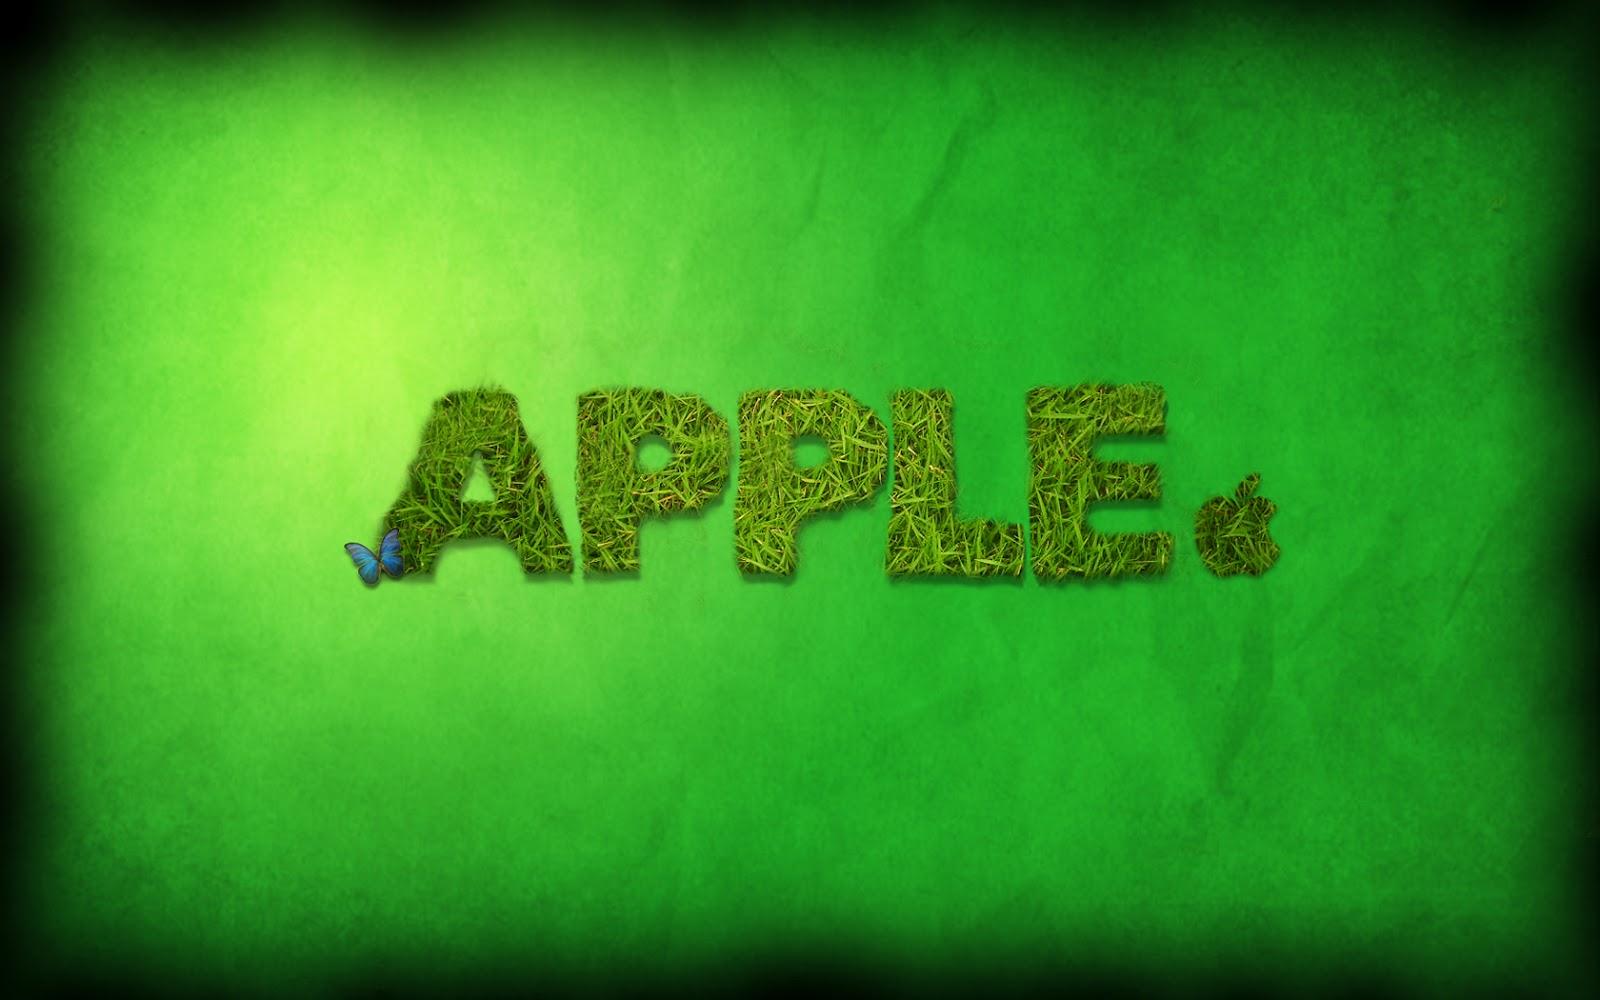 http://4.bp.blogspot.com/-wLsyzJaxNhM/T-aAJgfCV5I/AAAAAAAAALg/resOfKMSUqM/s1600/iphone%2B_Apple_Mac_OS_X_The_Best_HD_wallpapers_background%2B030.jpg